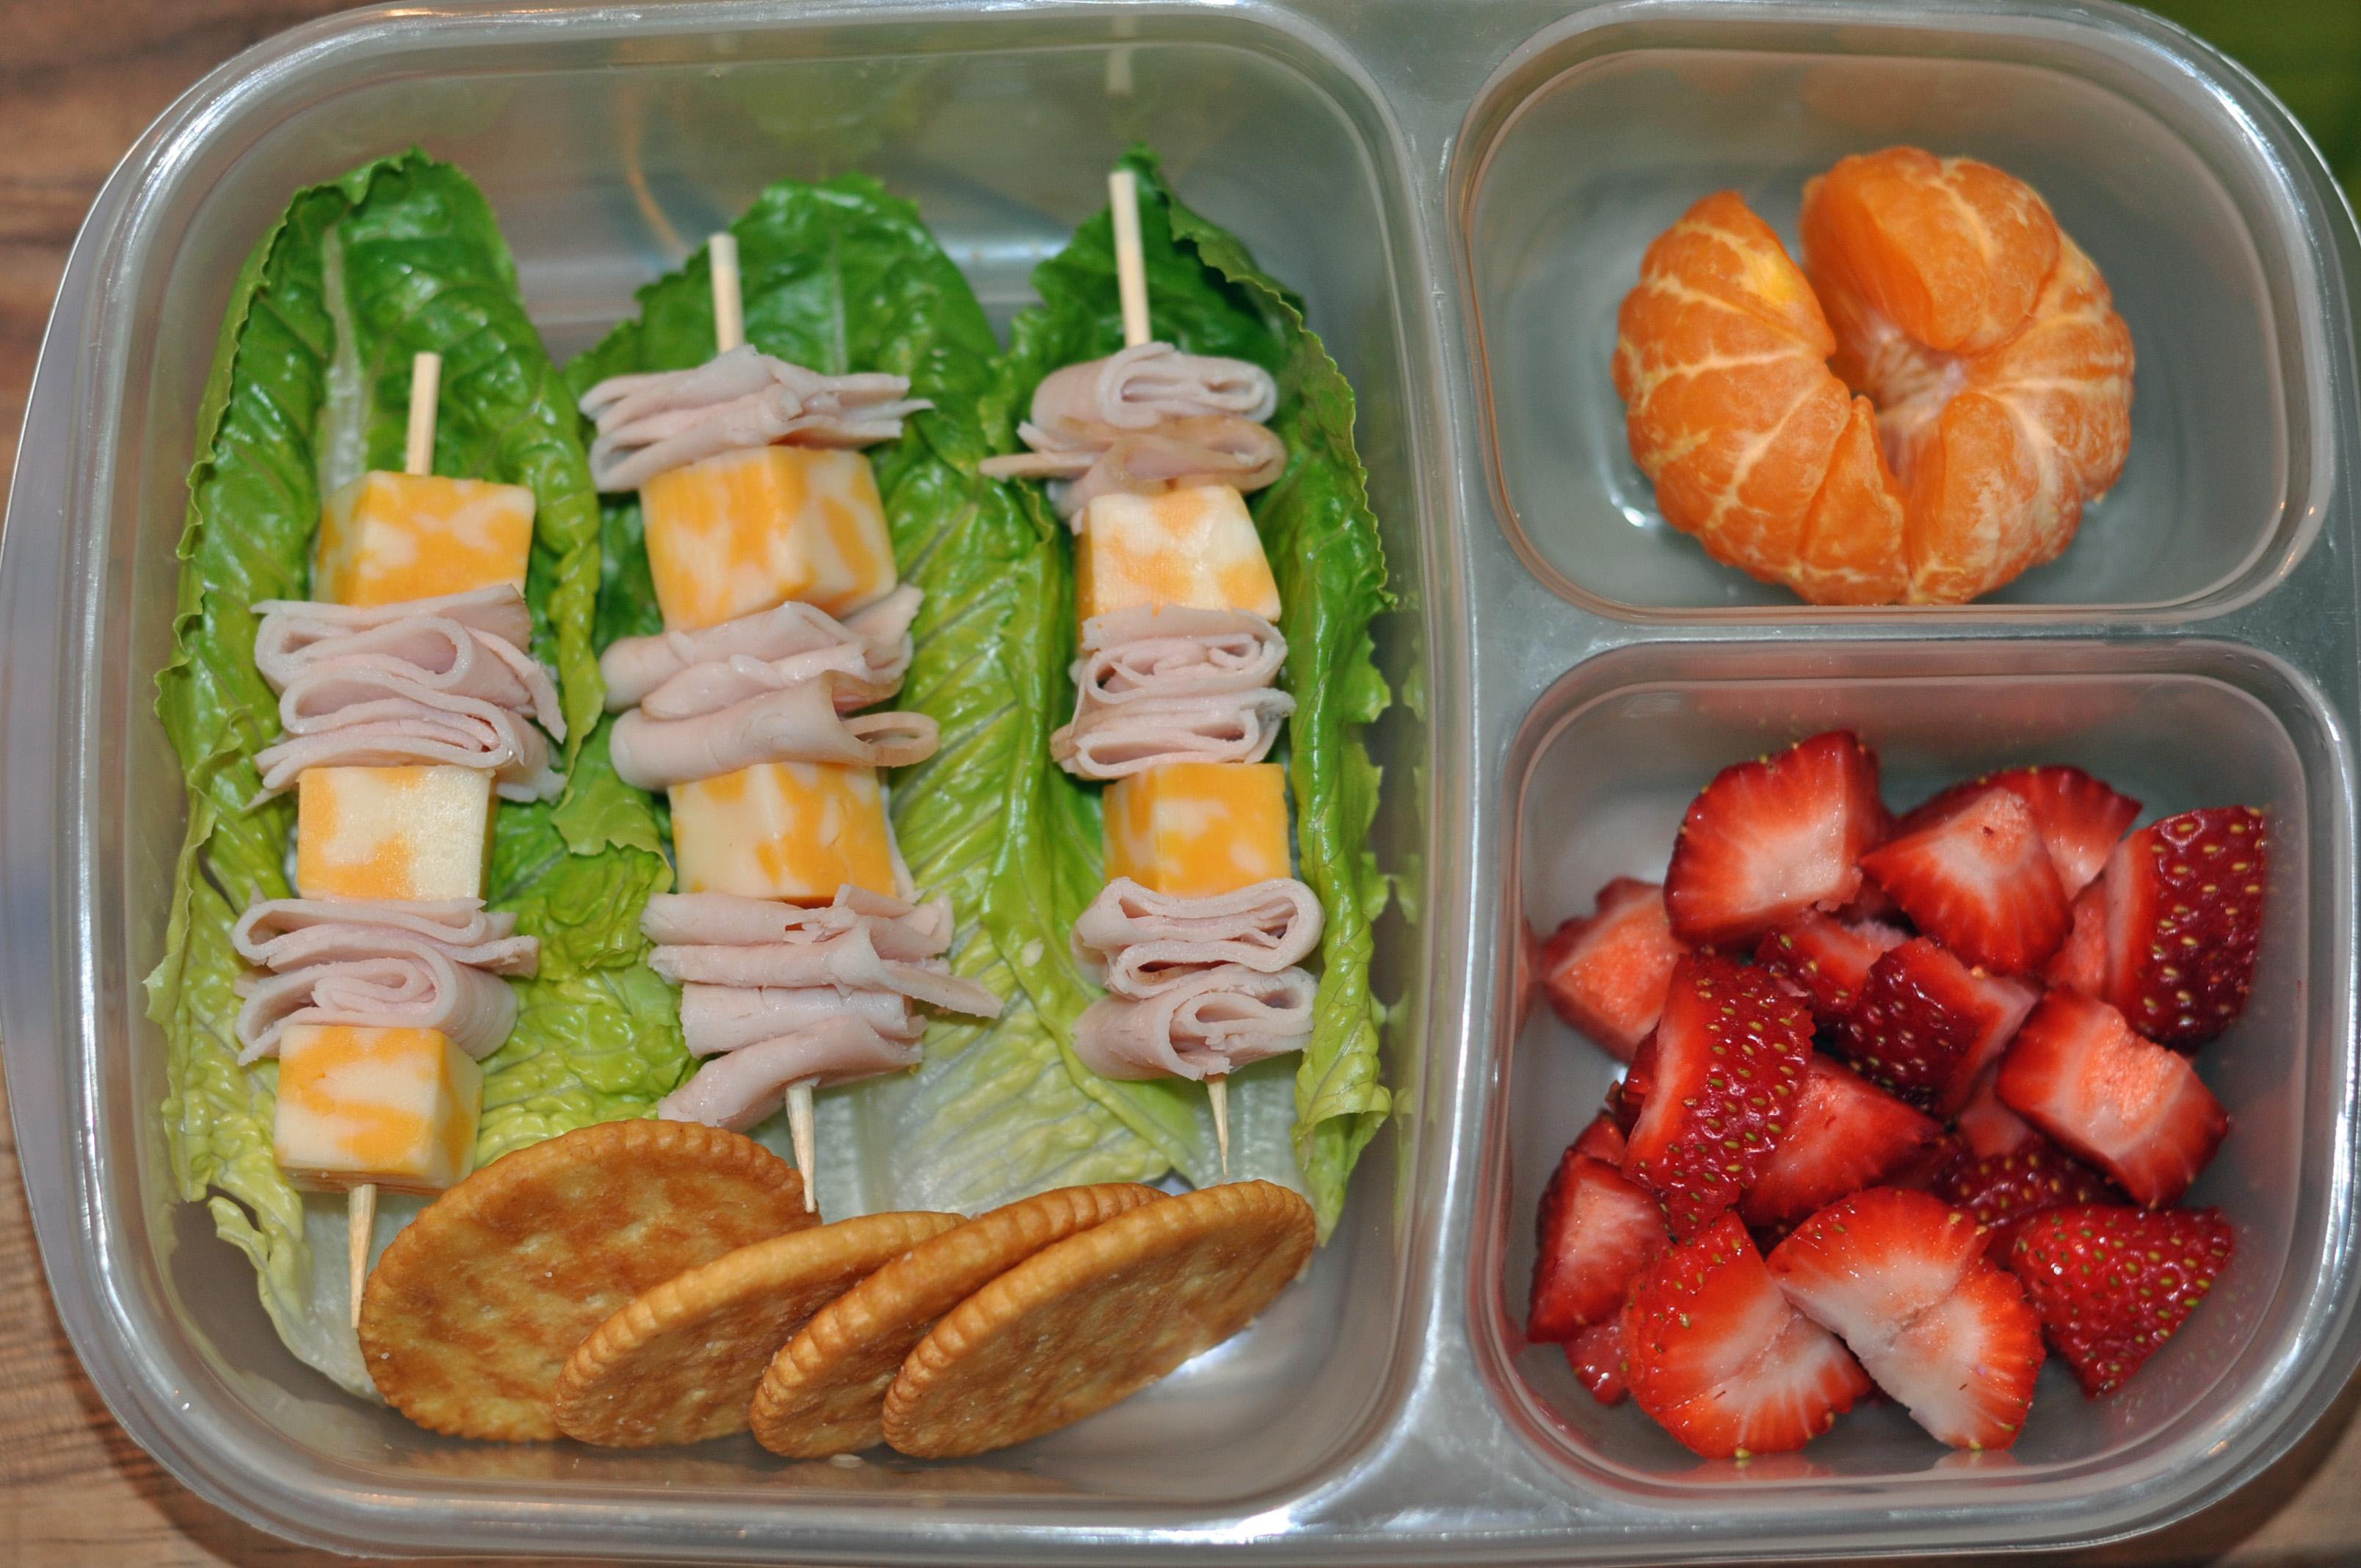 Hillshire Farm Lunch Ideas Easy School Lunches #HillshireNaturals